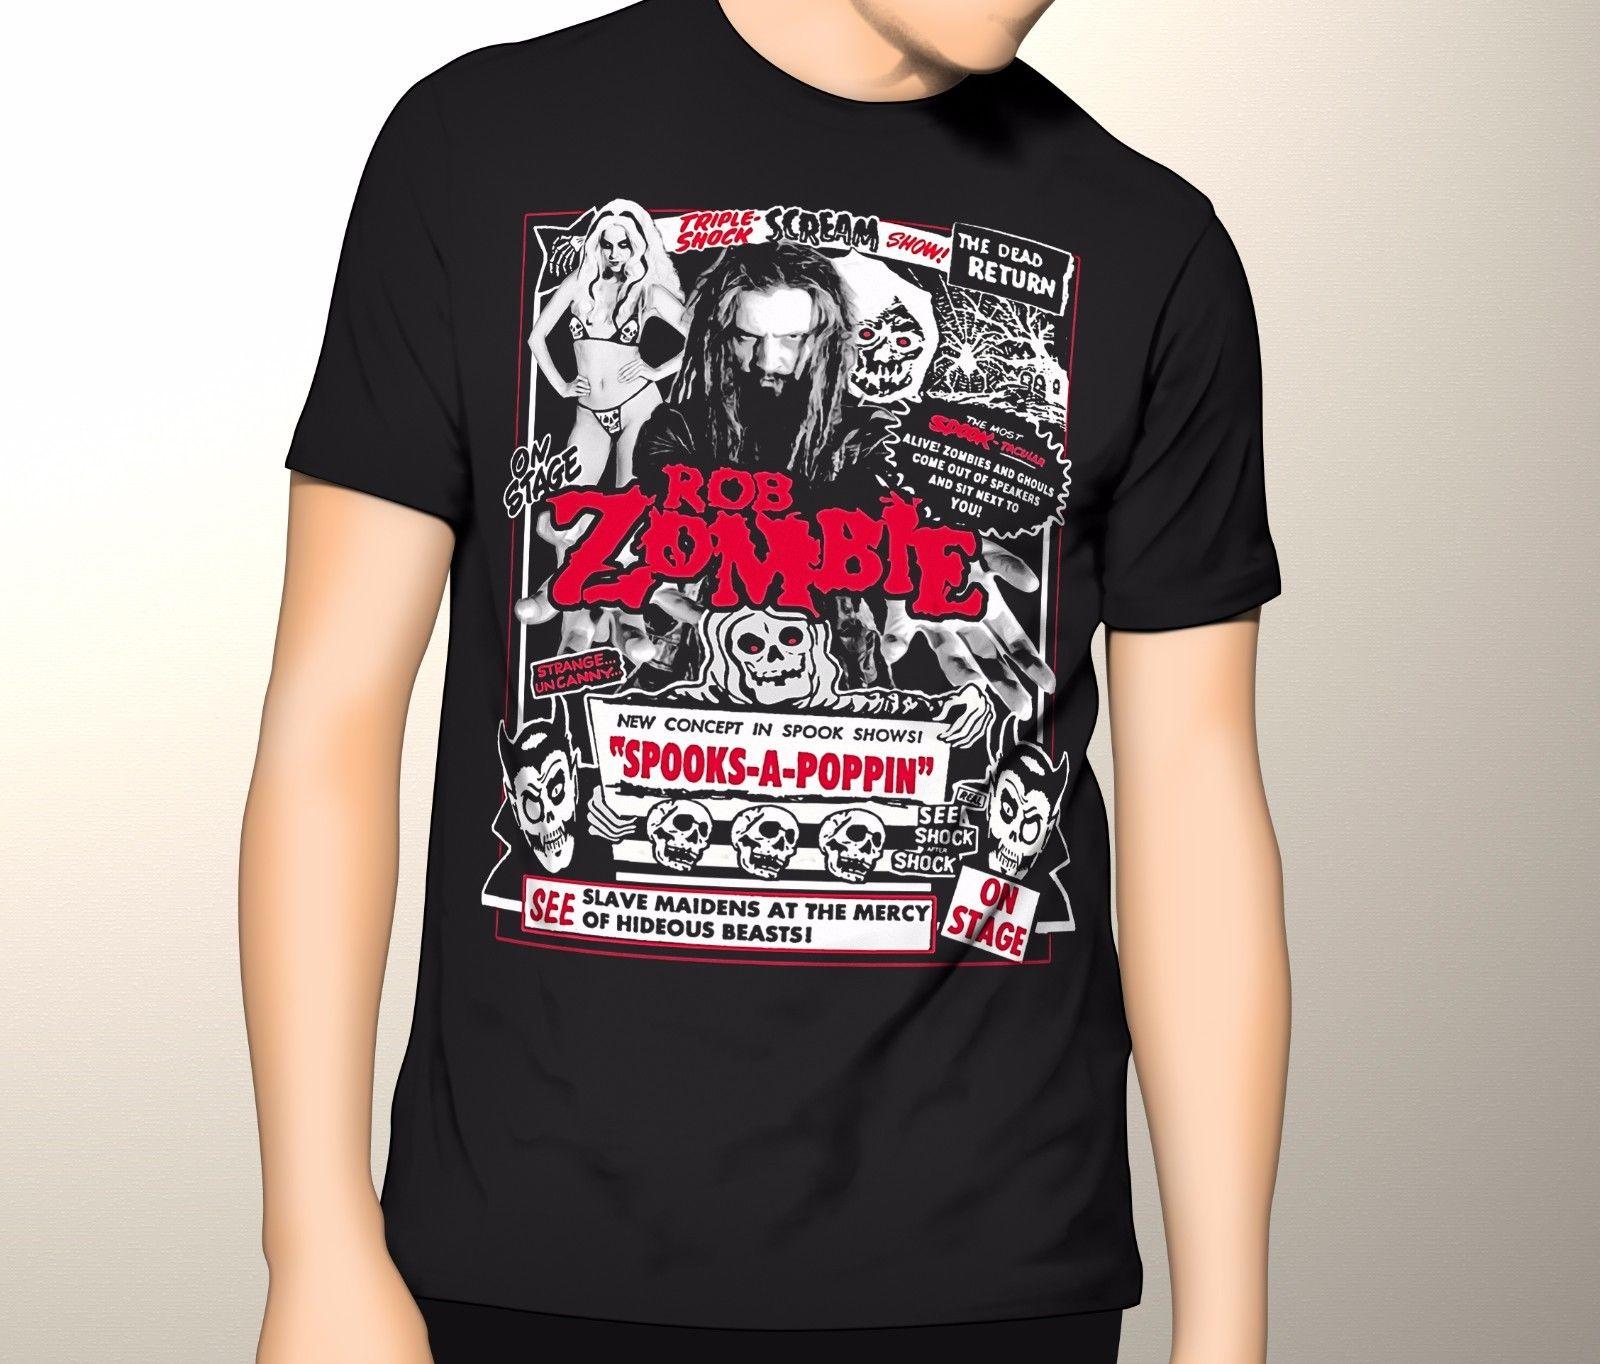 Rob Zombie muerto volver HORROR oculto camiseta película S-3XL nueva moda para hombre Camiseta de manga corta de algodón tee Top